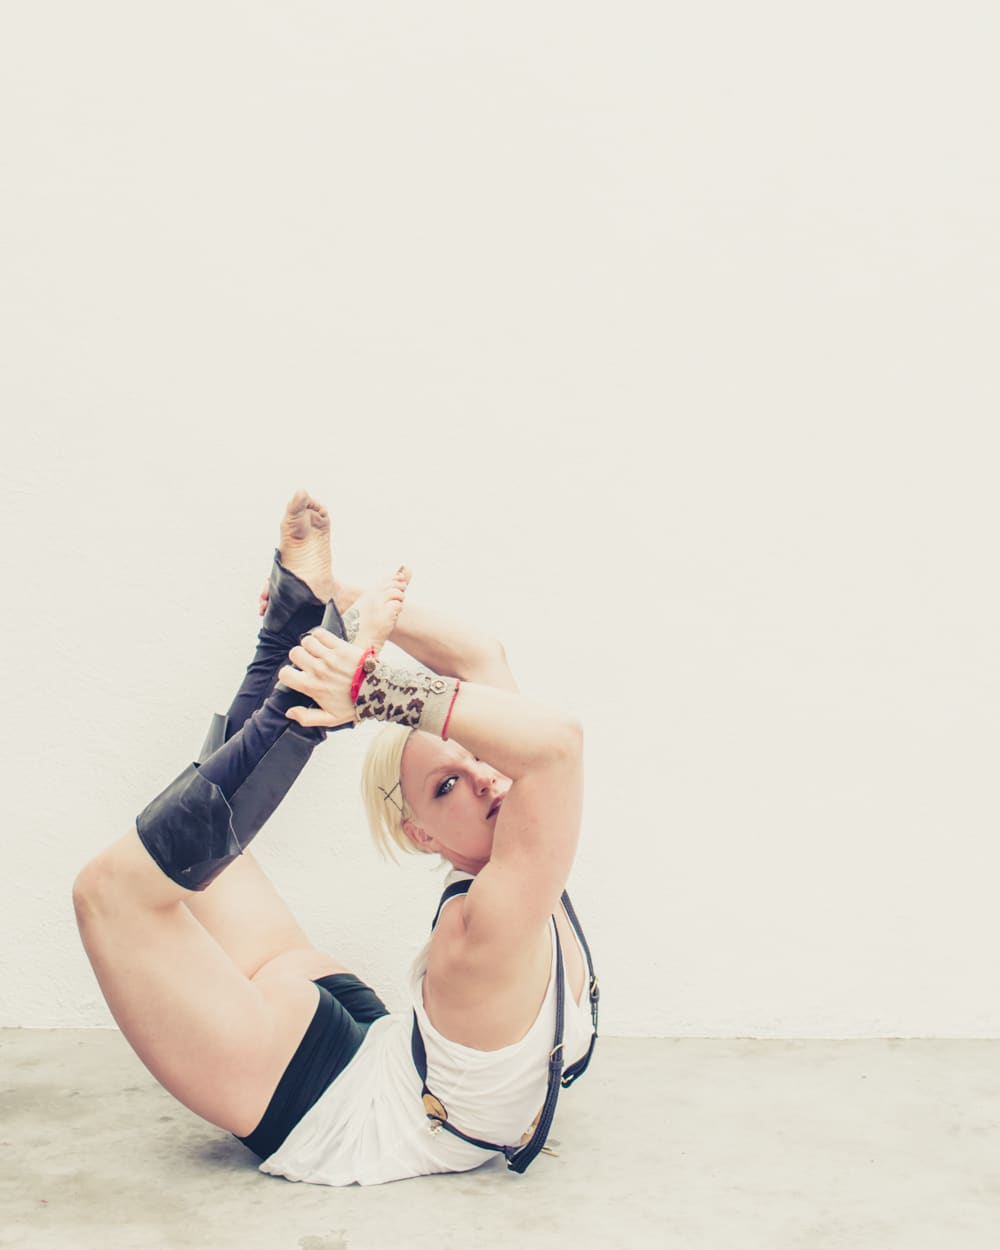 pole_dance_contorts_fashion_gregory_beylerian_3